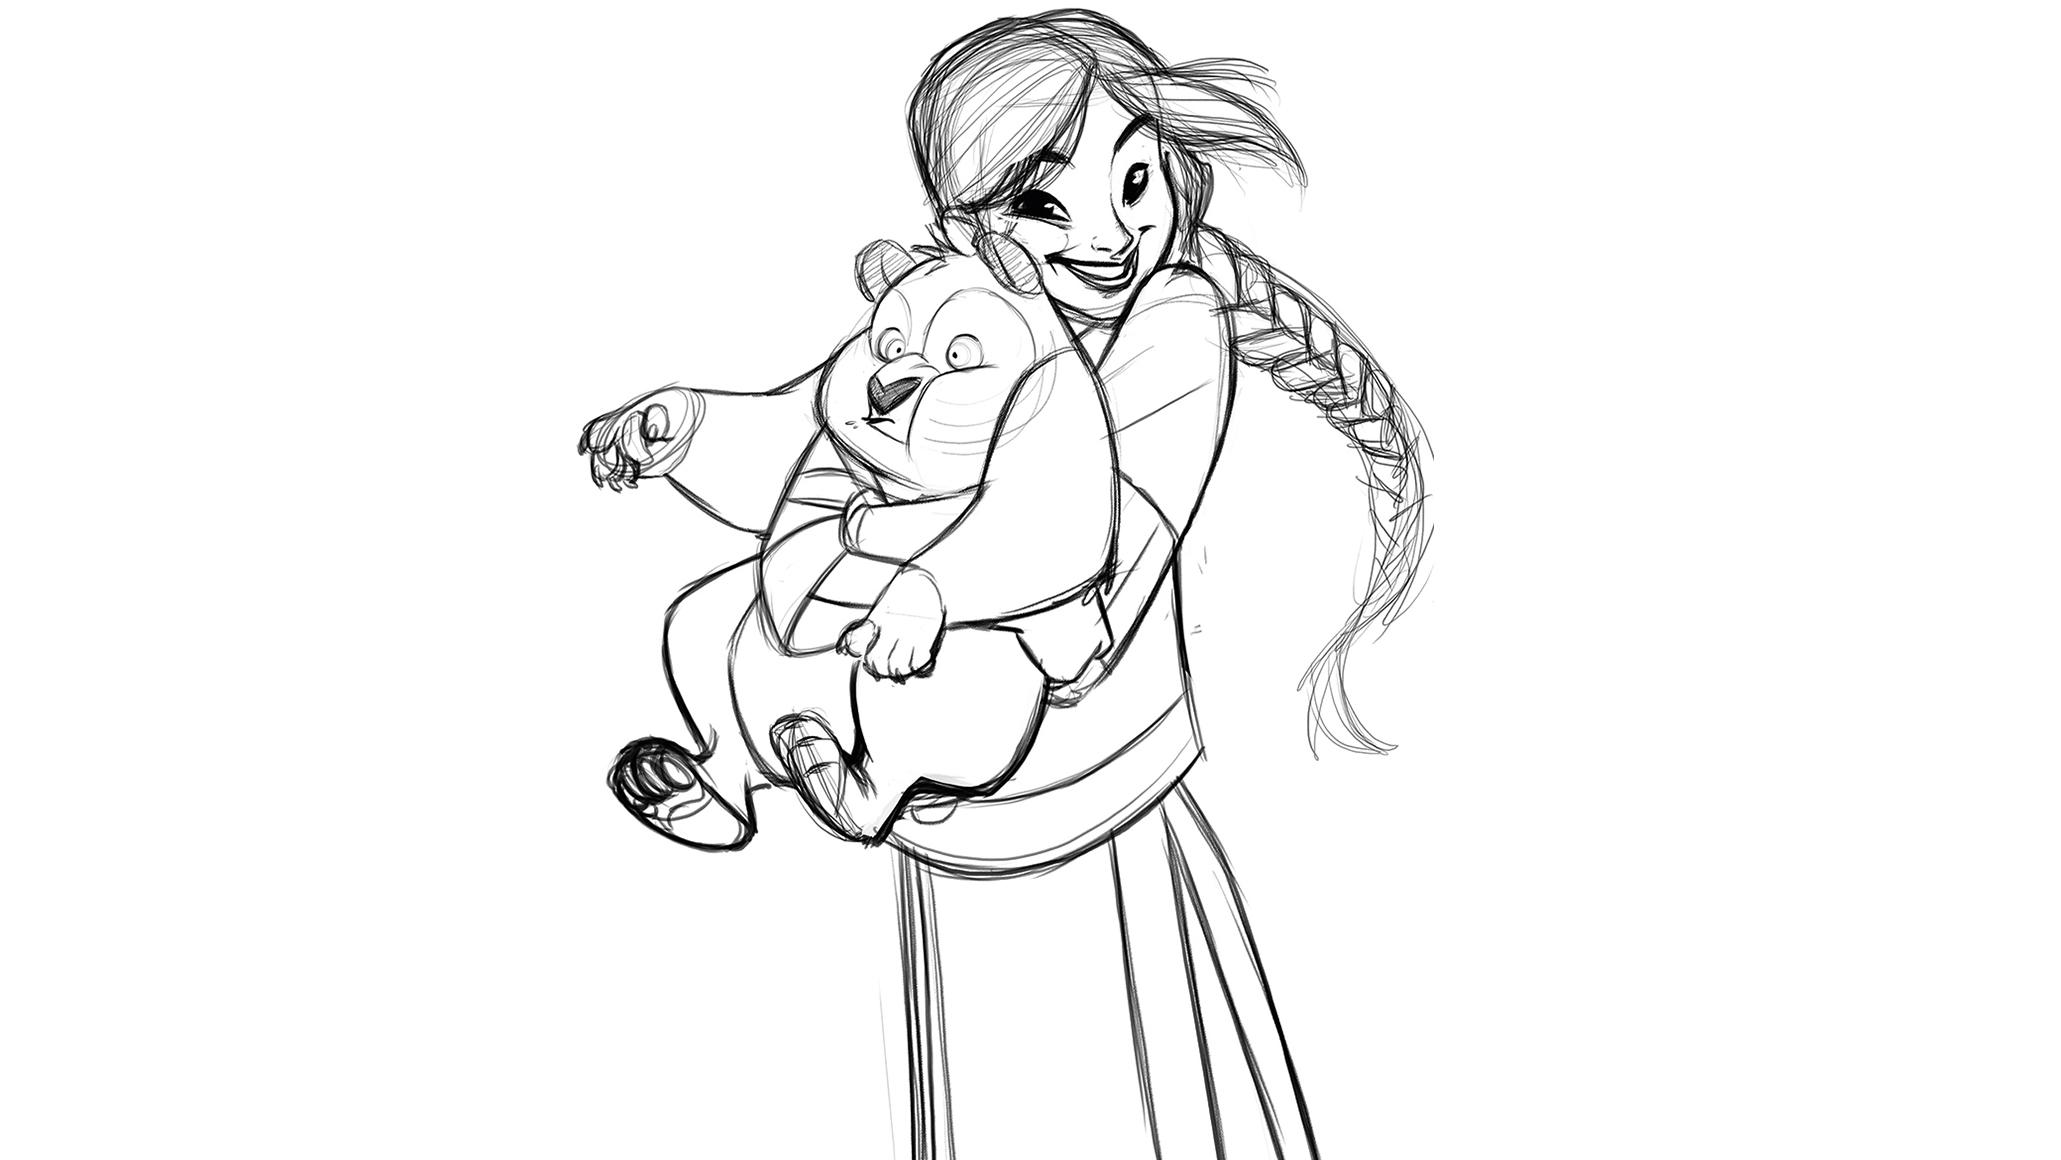 Rough sketch of girl with panda